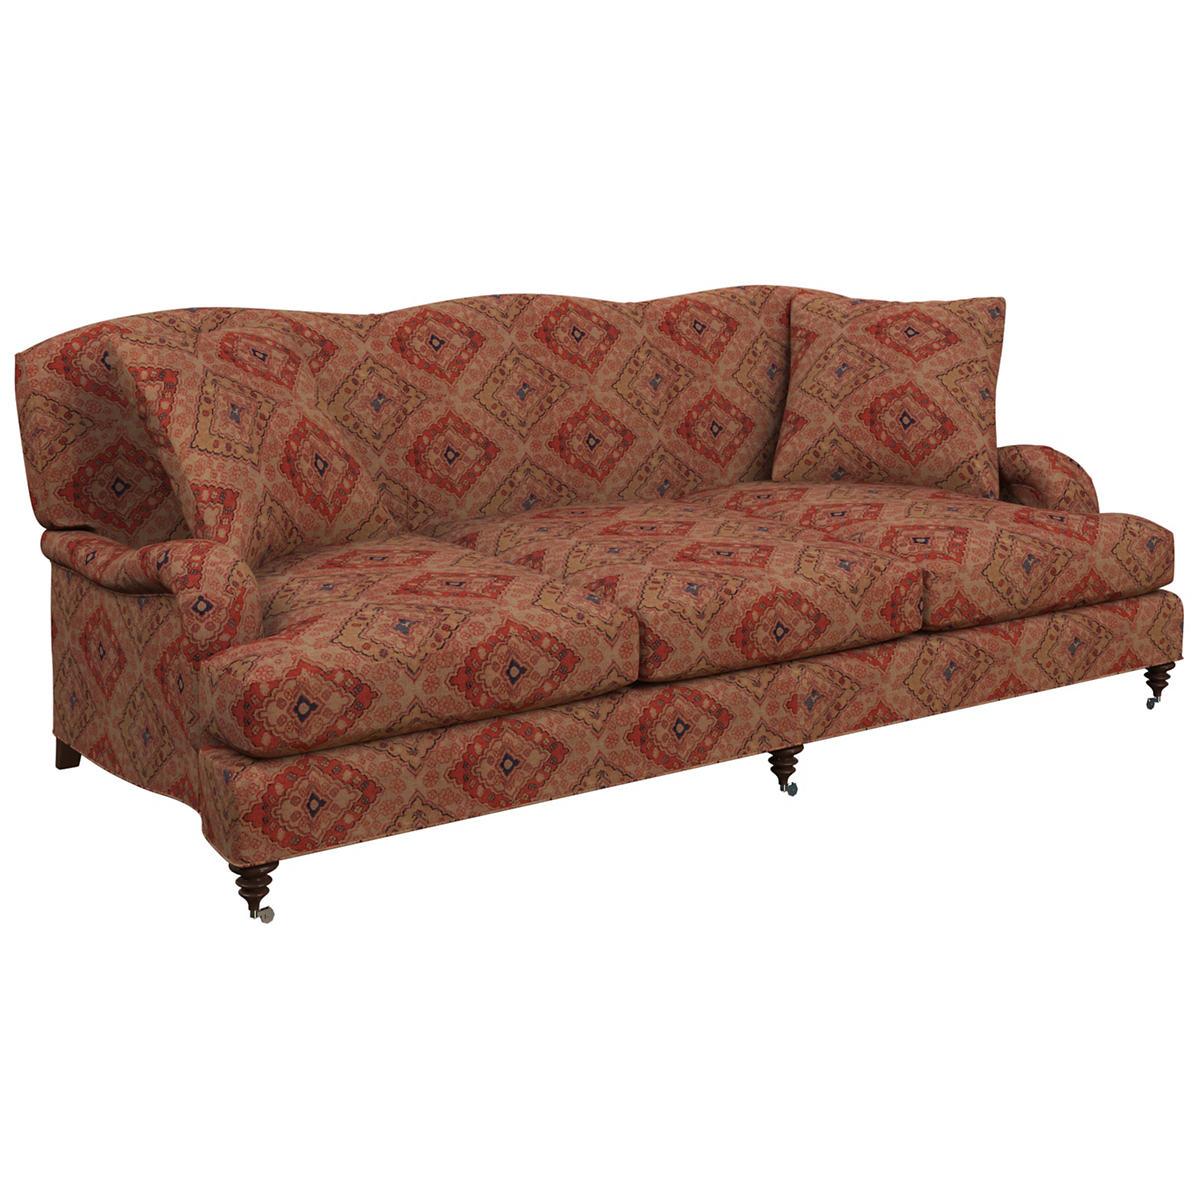 Yasmine Linen Litchfield 3 Seater Sofa